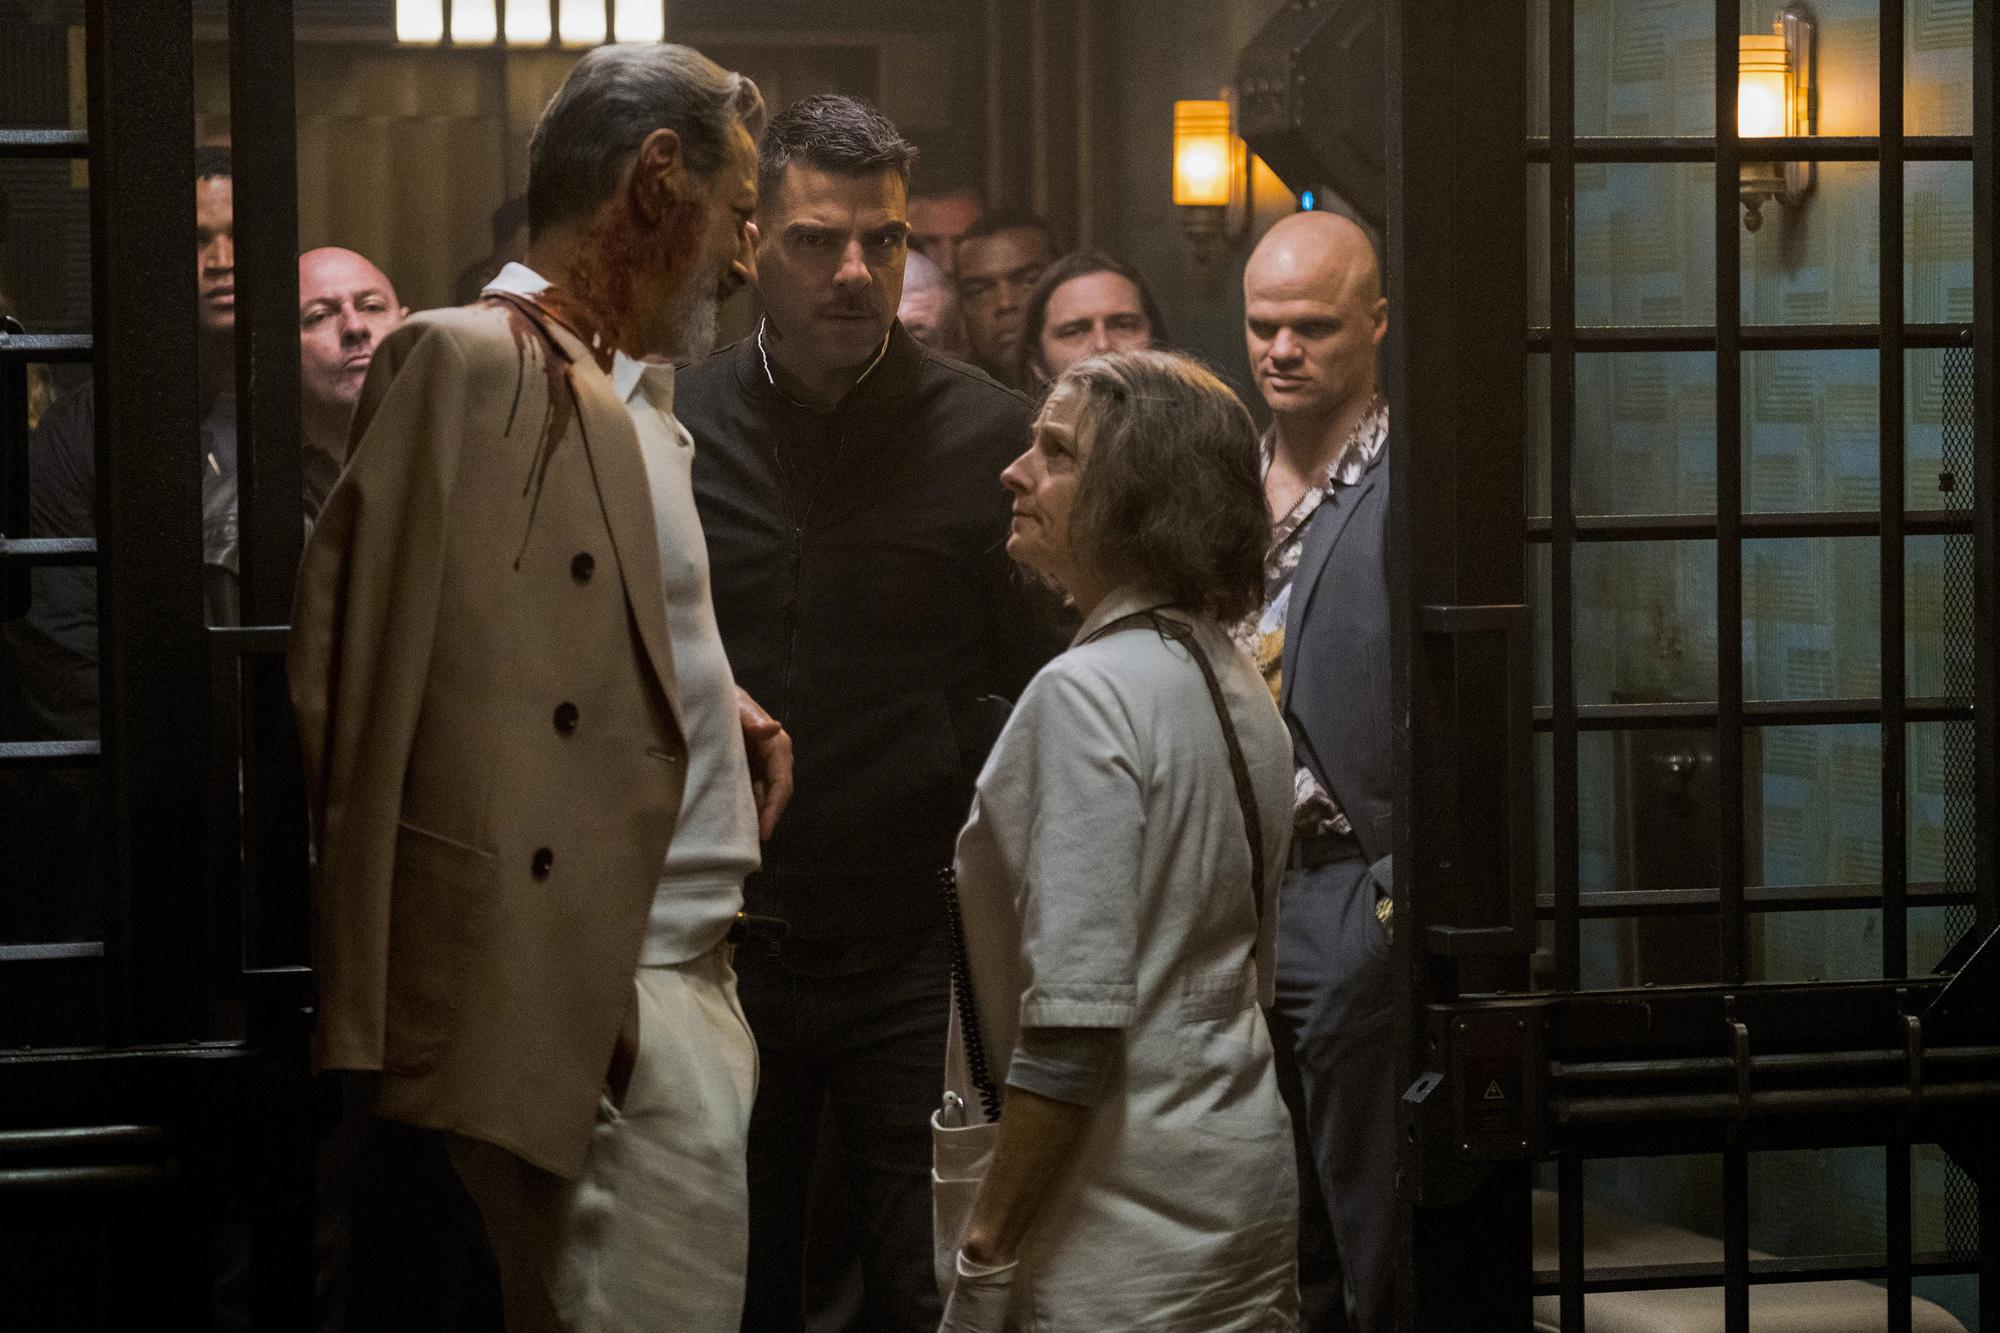 Goldblum, Quinto and Foster in Hotel Artemis.